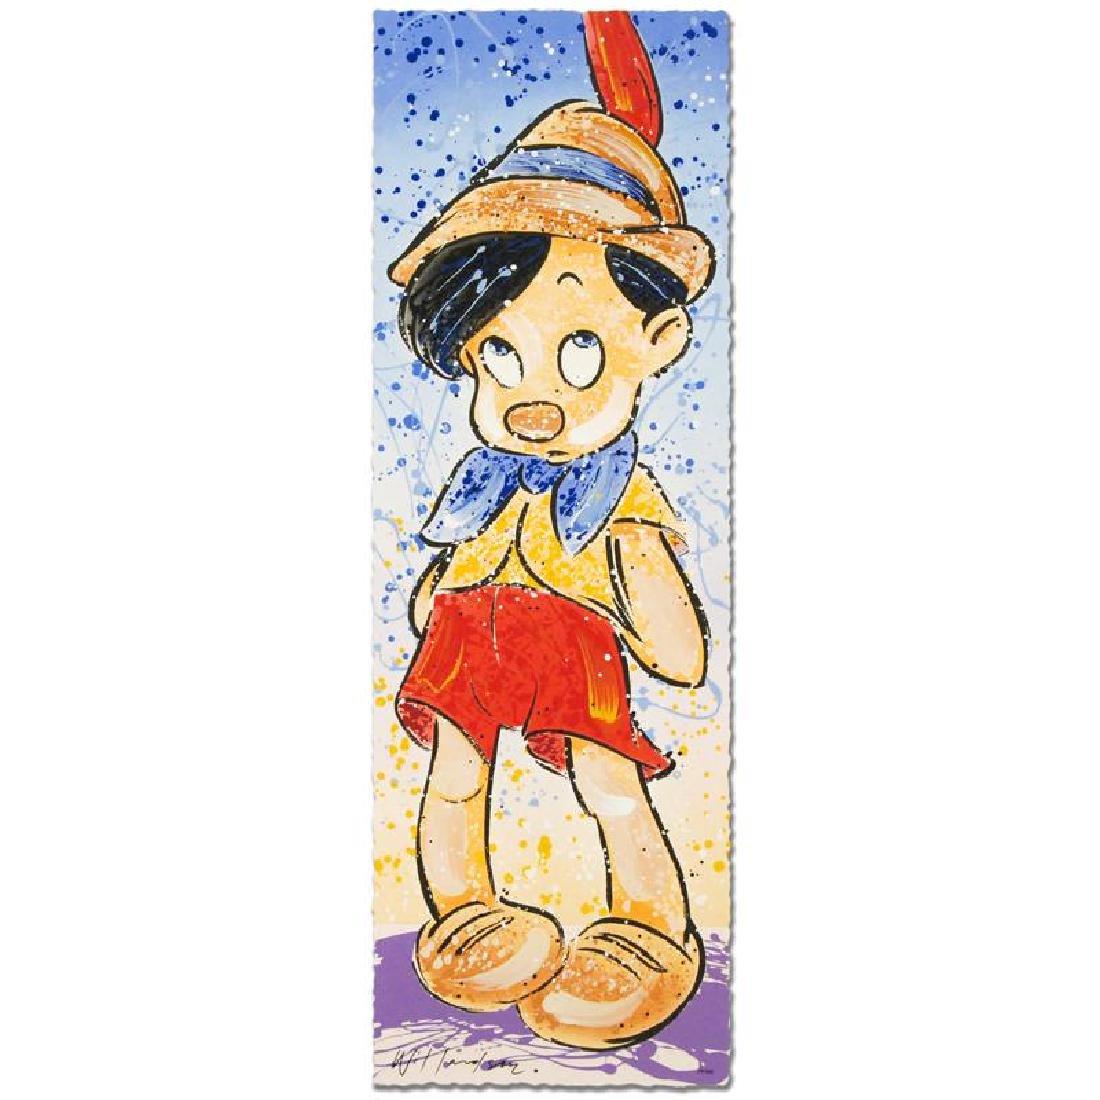 """Pinocchio"" Disney Limited Edition Serigraph (12"" x"